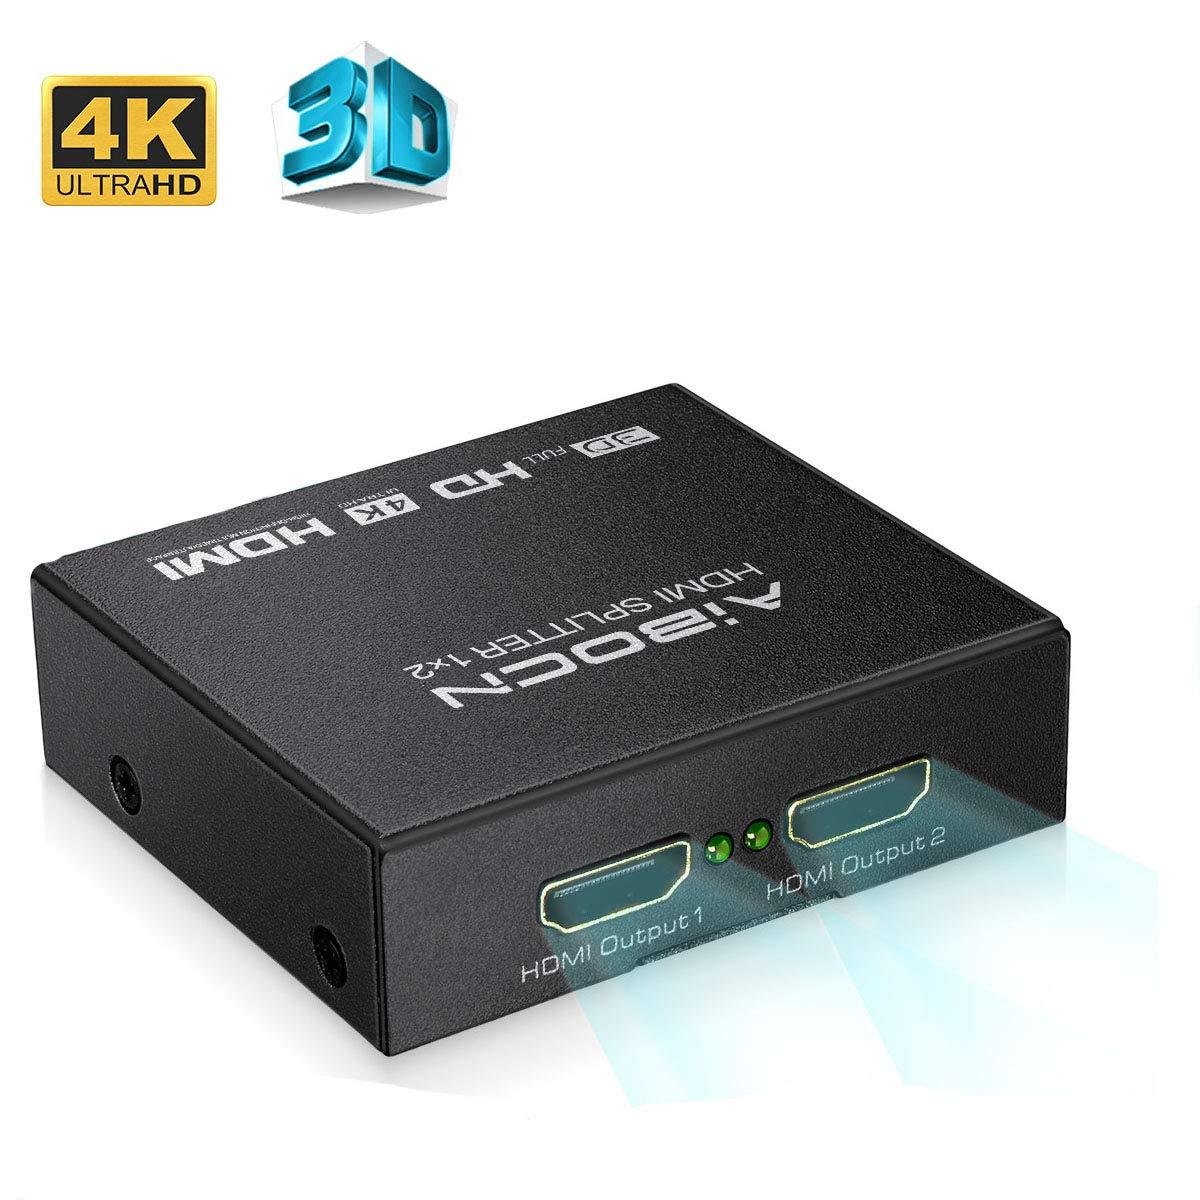 Aibocn HDMI Splitter 1x2, Divisor Splitter 4K 1080P HD 3D HDMI para TV/PS4/PS3/XboX/DVD BLU-Ray, Color Negro